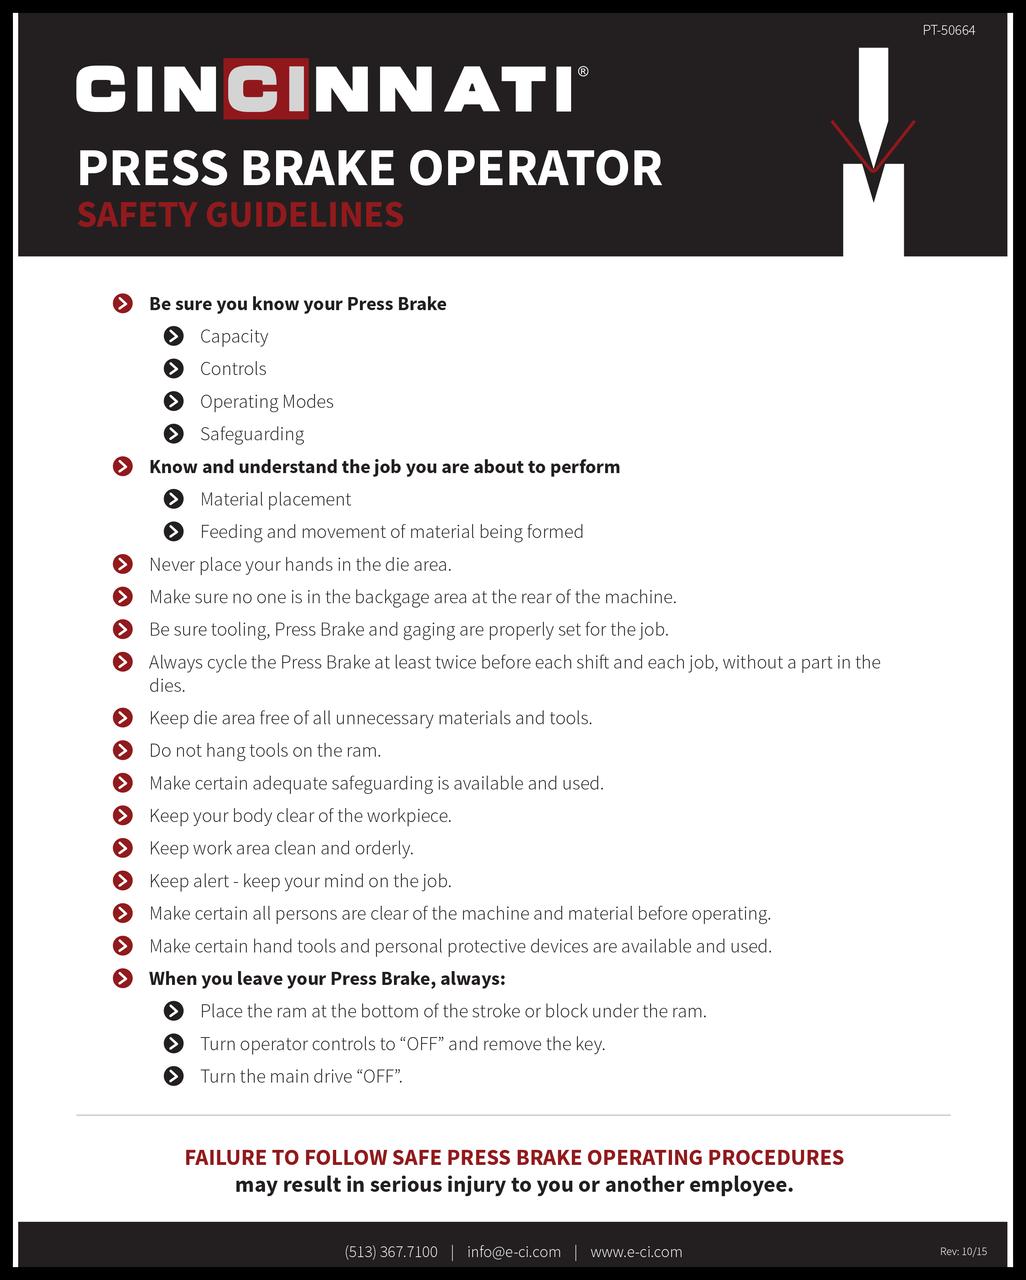 PT-50691_Press Brake Capacities_10-15